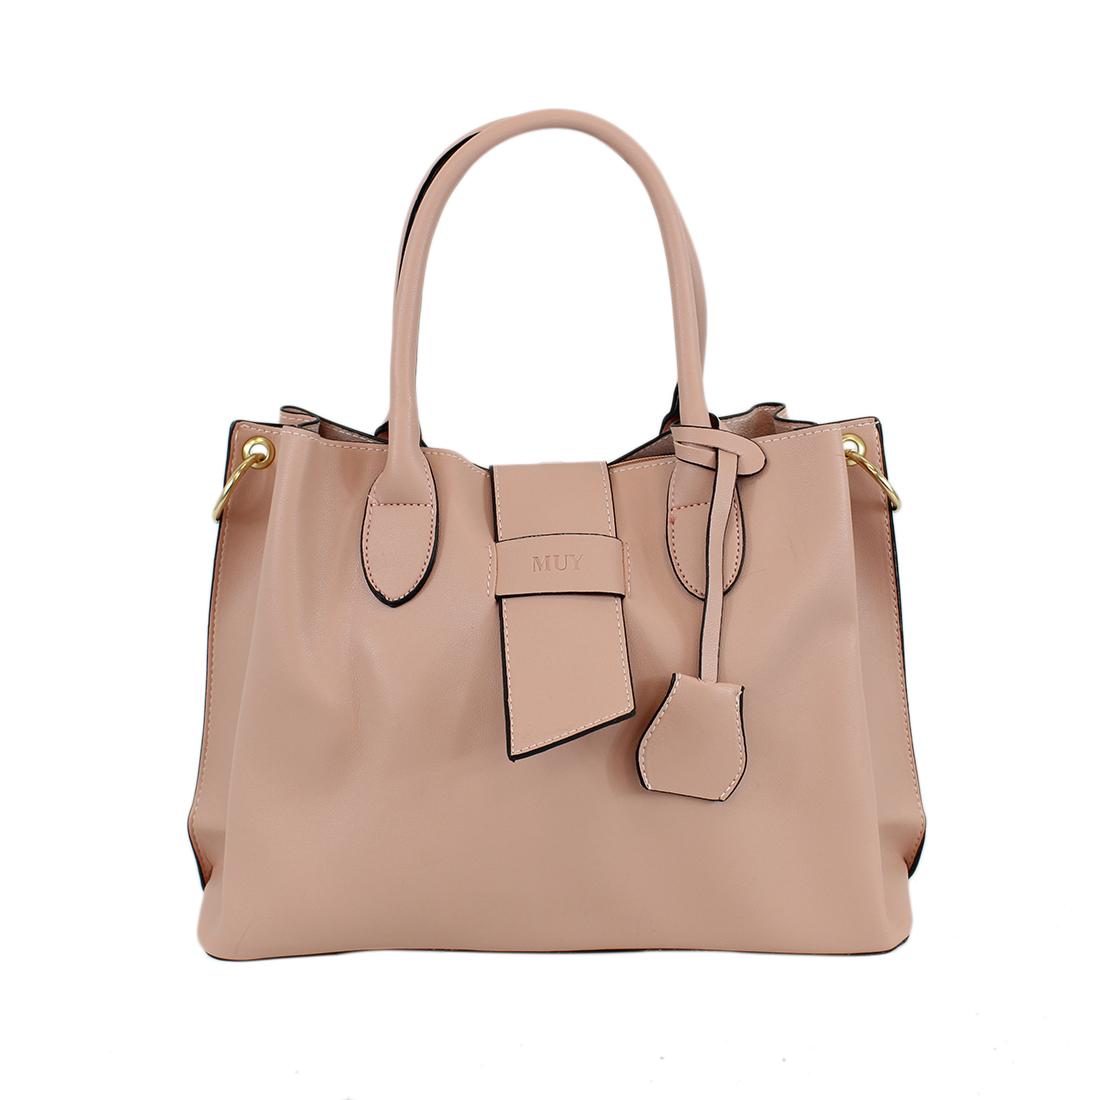 Retro large capacity plain shoulder bag